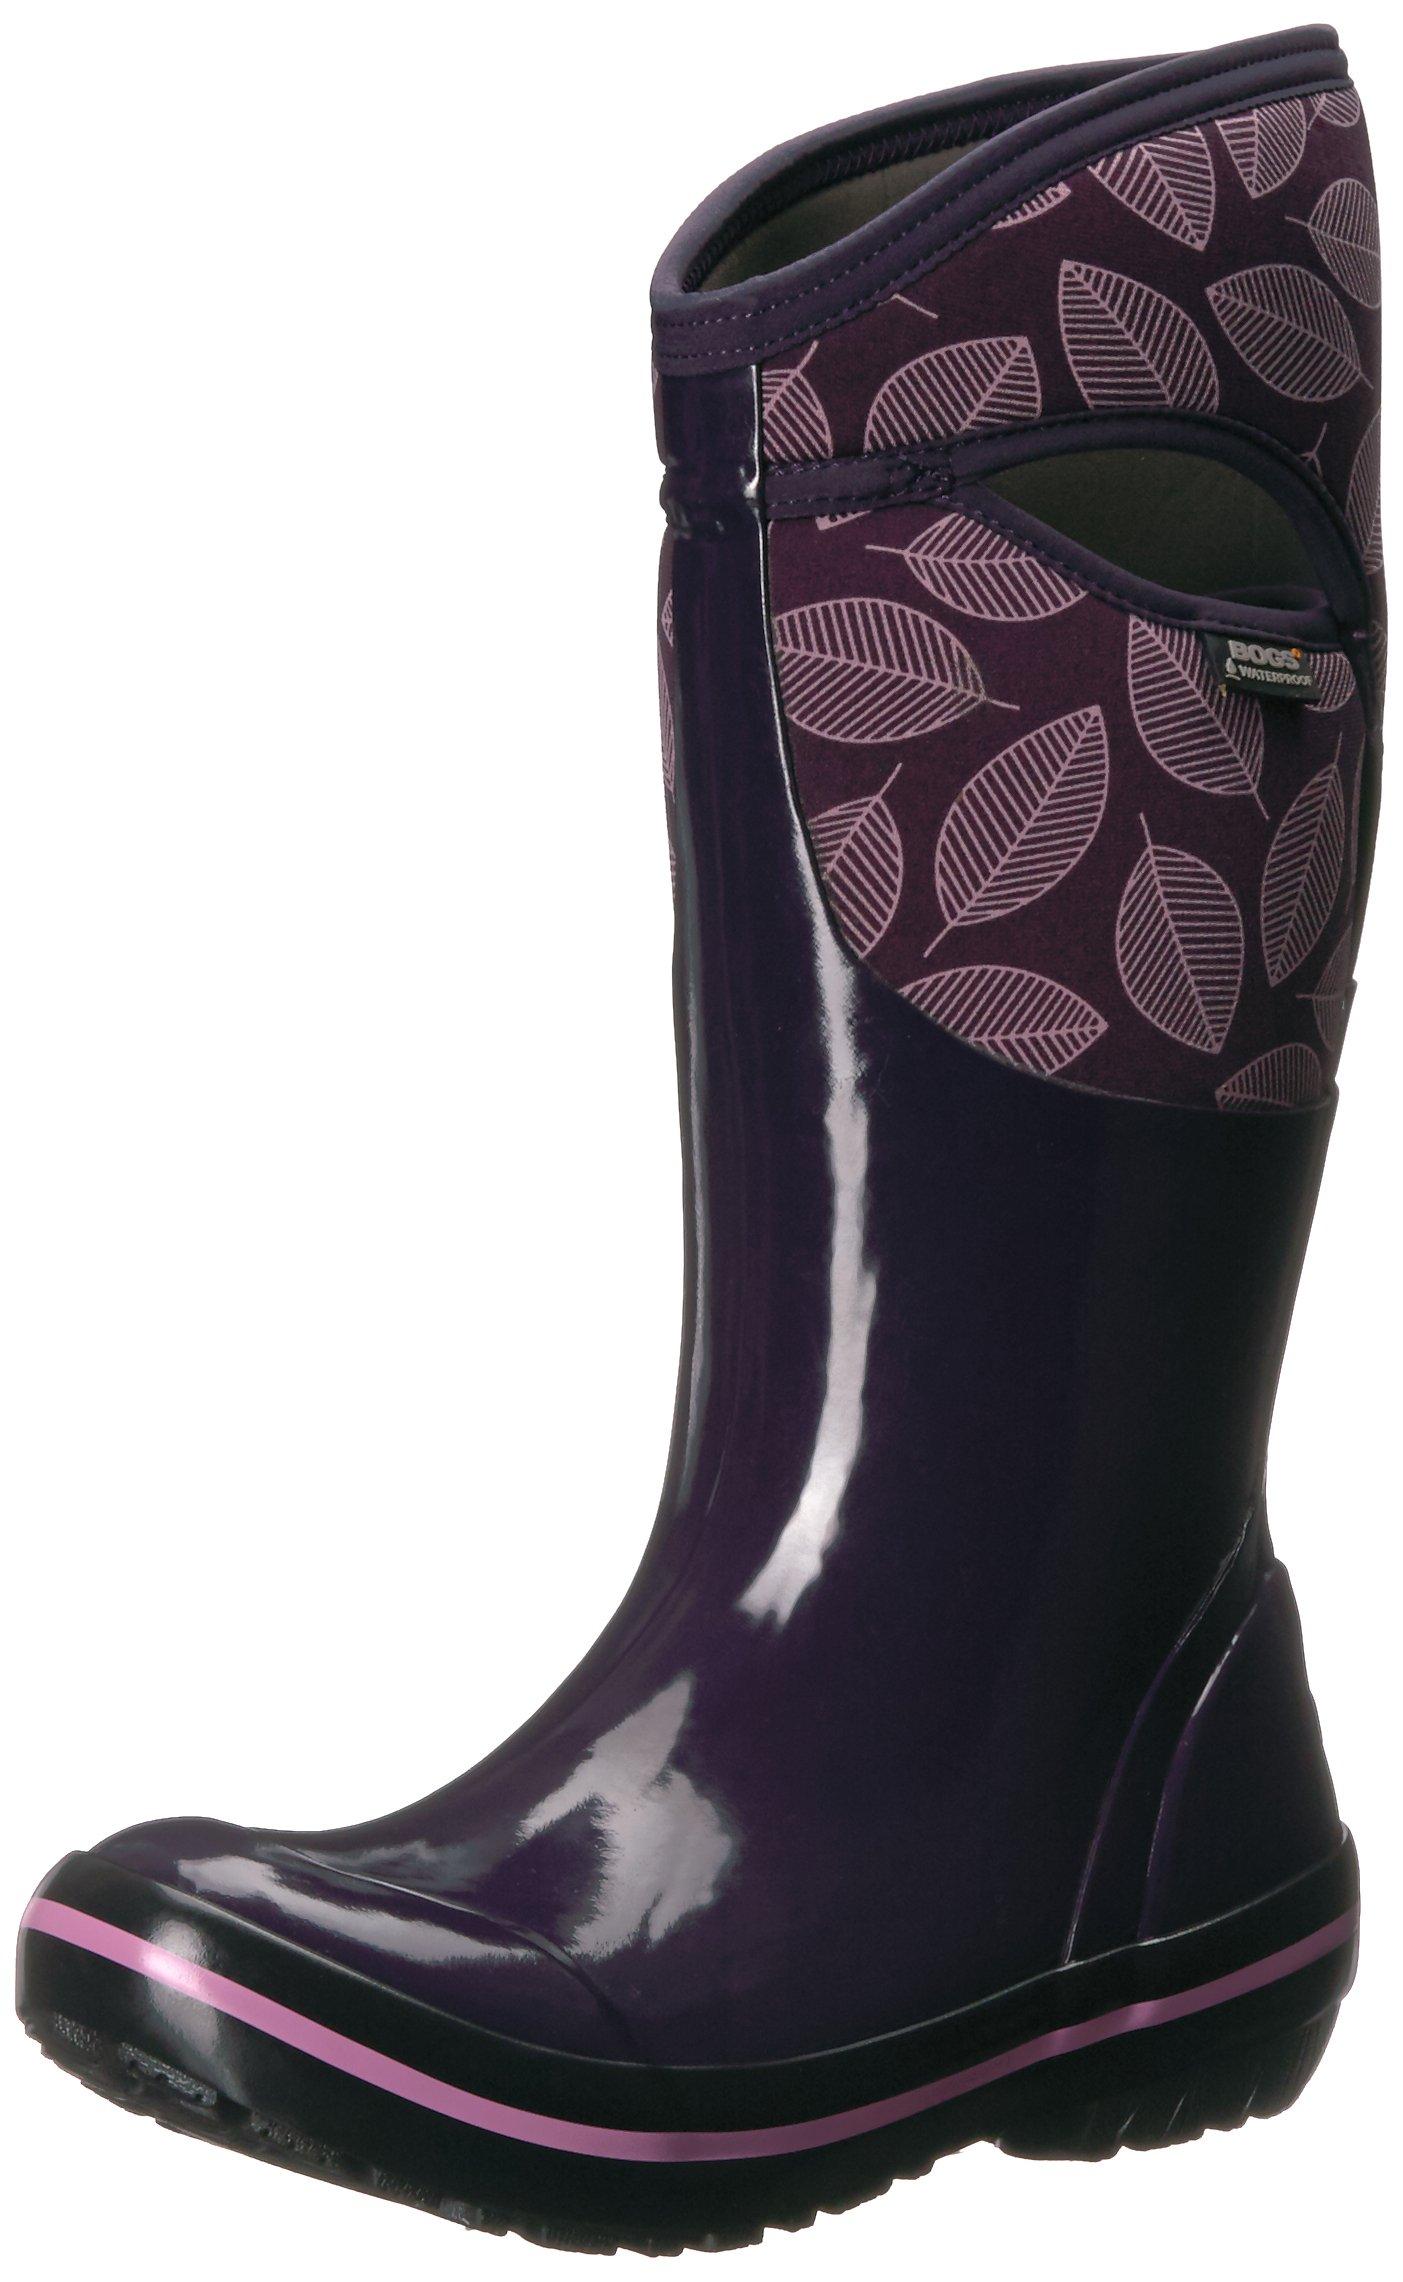 Bogs Women's Plimsoll Leafy Tall Snow Boot, Eggplant Multi, 8 M US